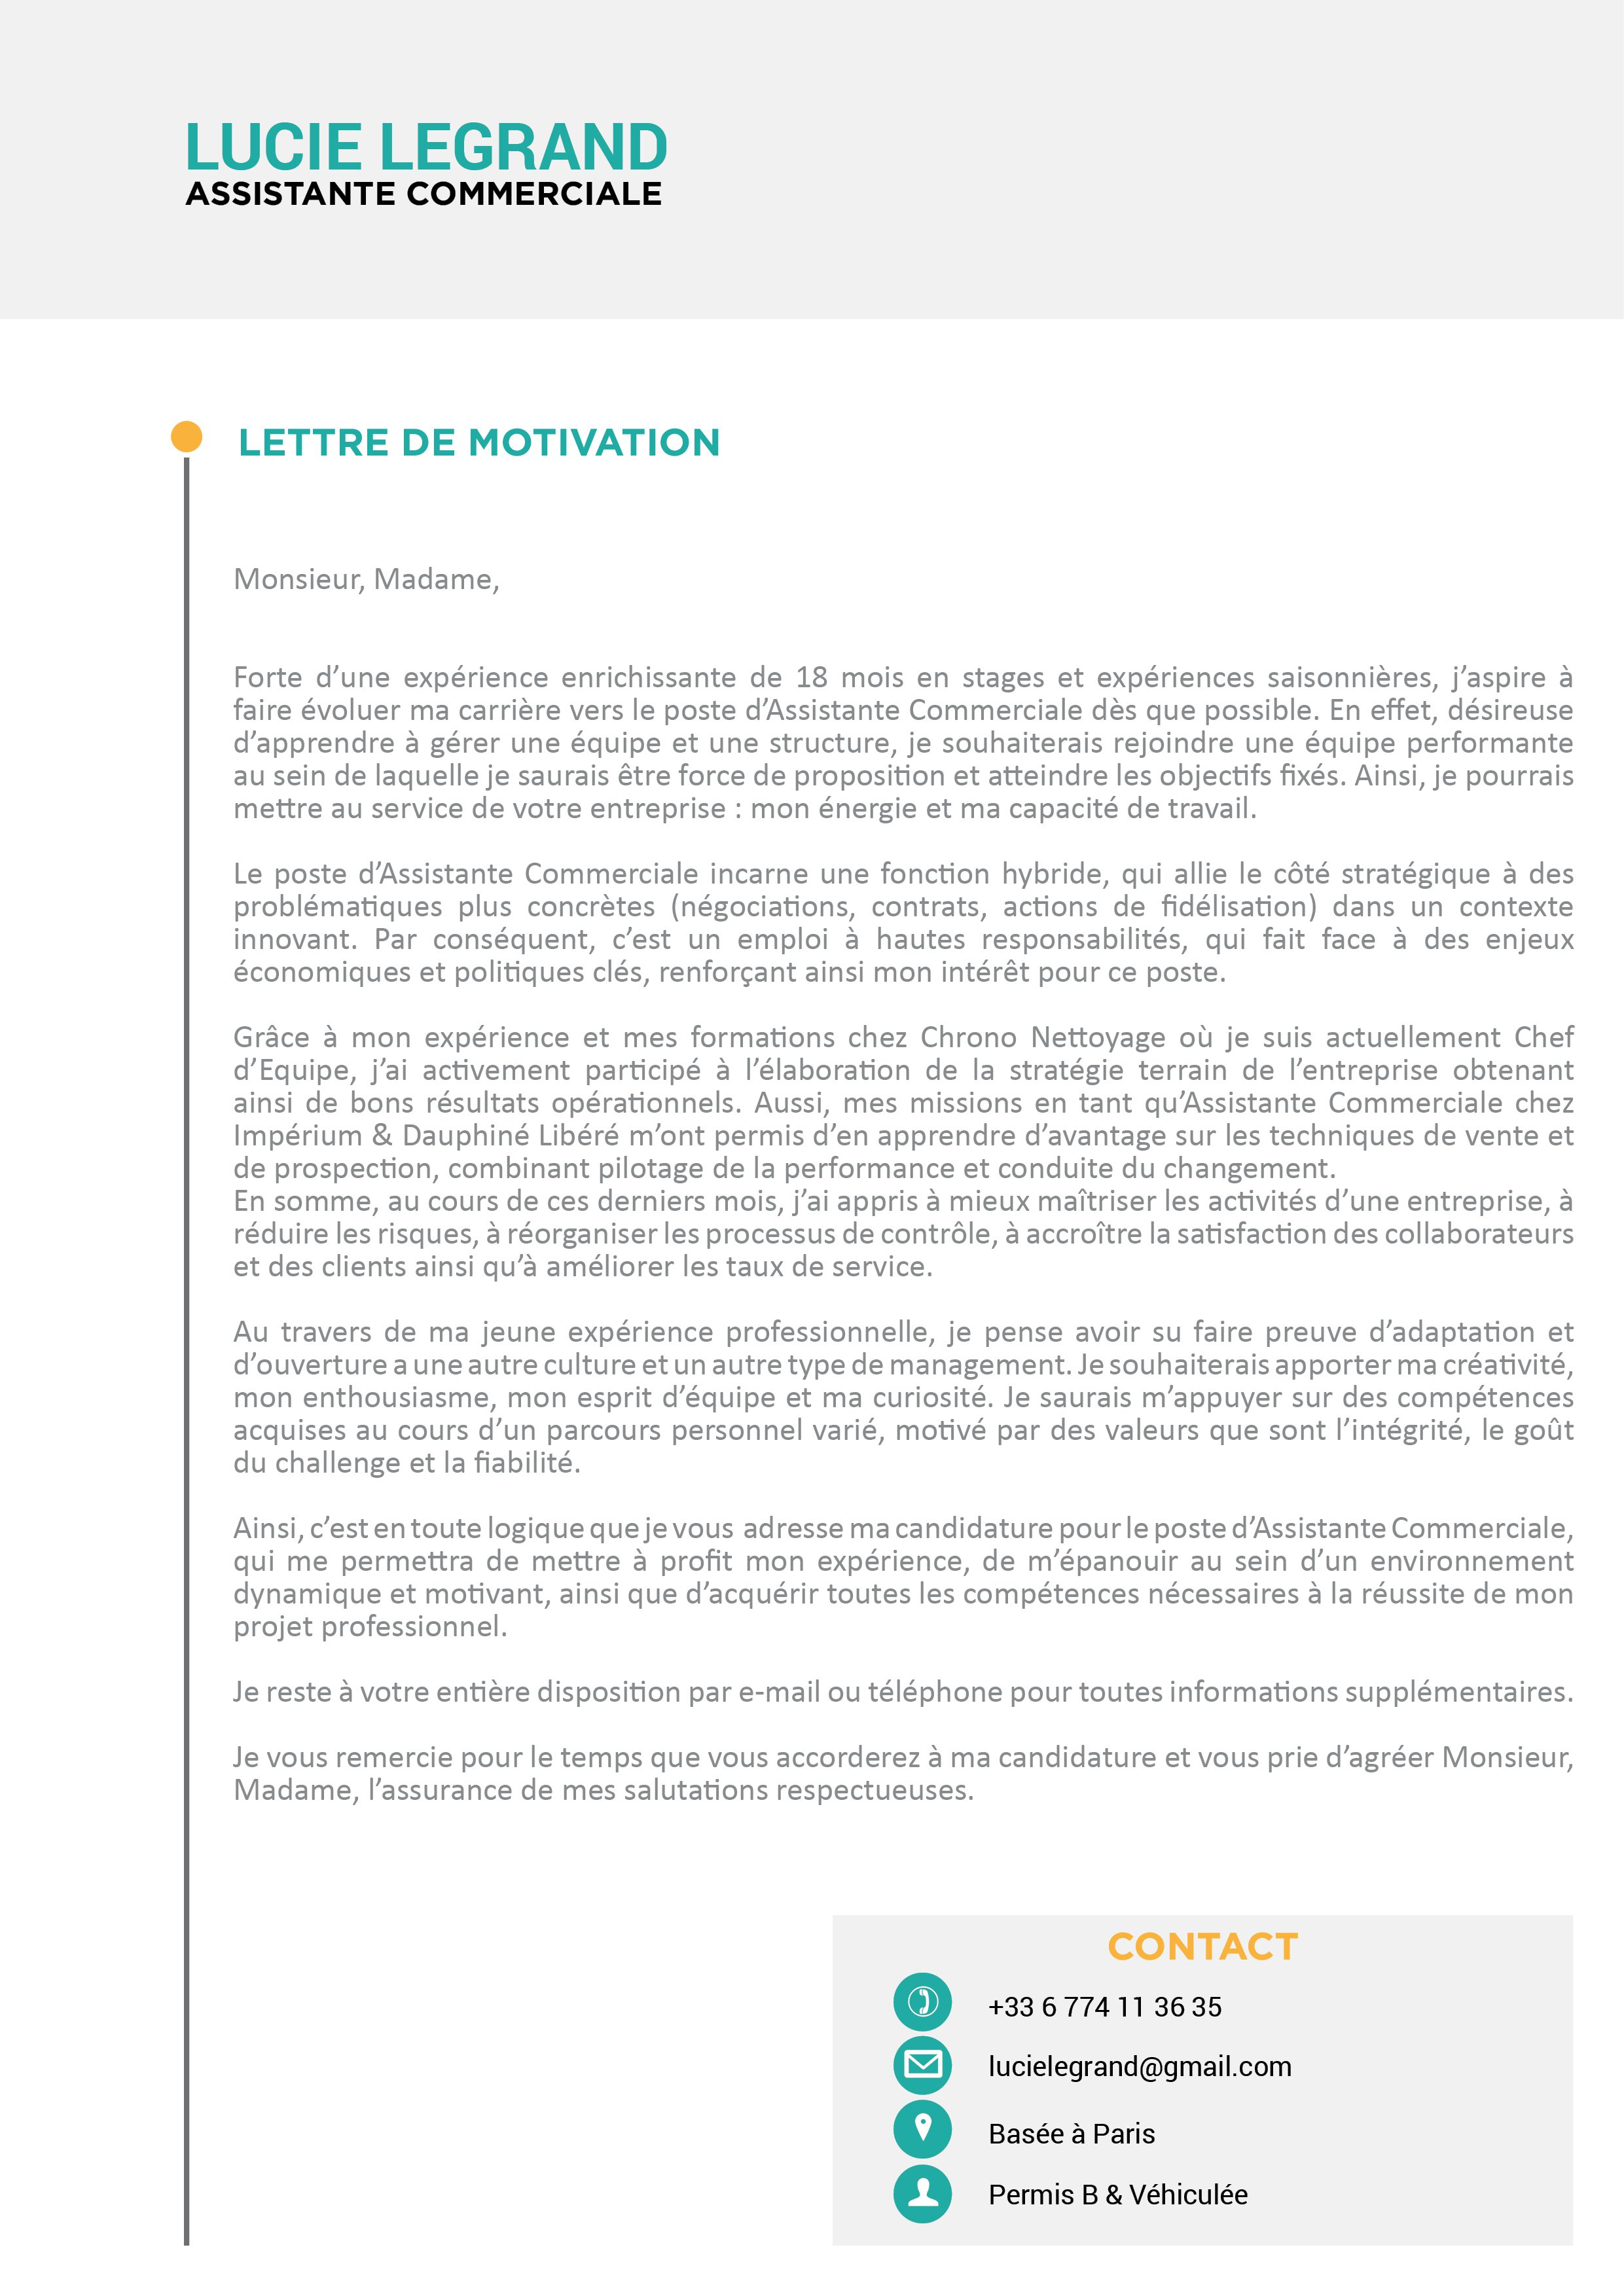 mycvfactory-cover-letter-la-canard-0.jpg